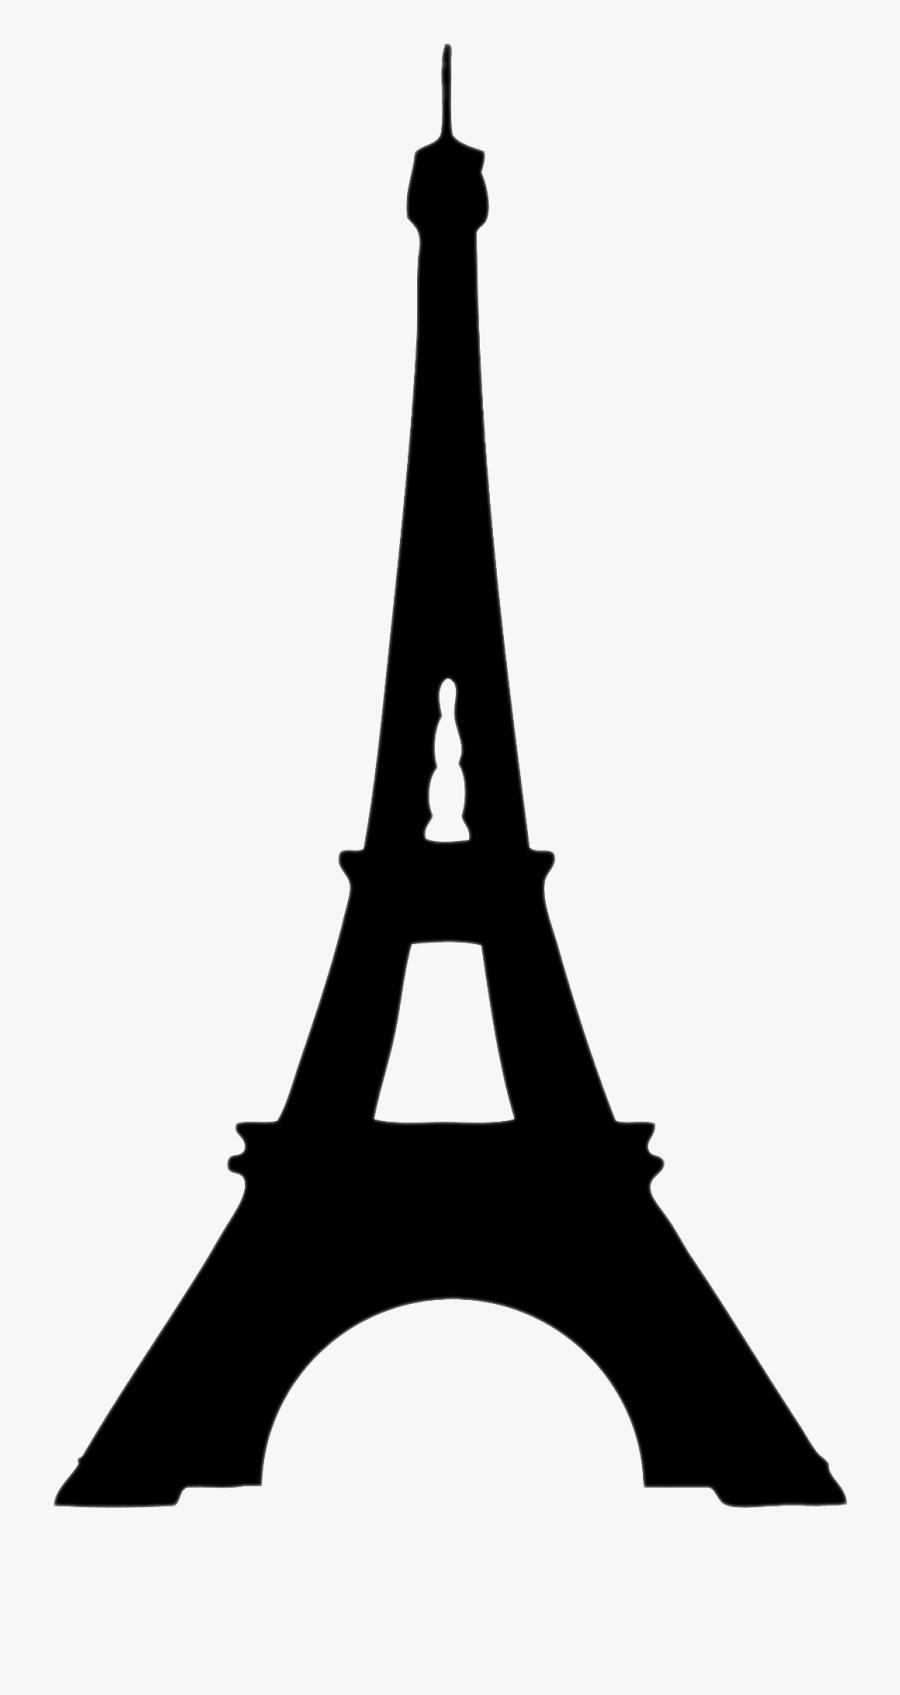 Eiffel Tower Transparent Png - Eiffel Tower, Transparent Clipart